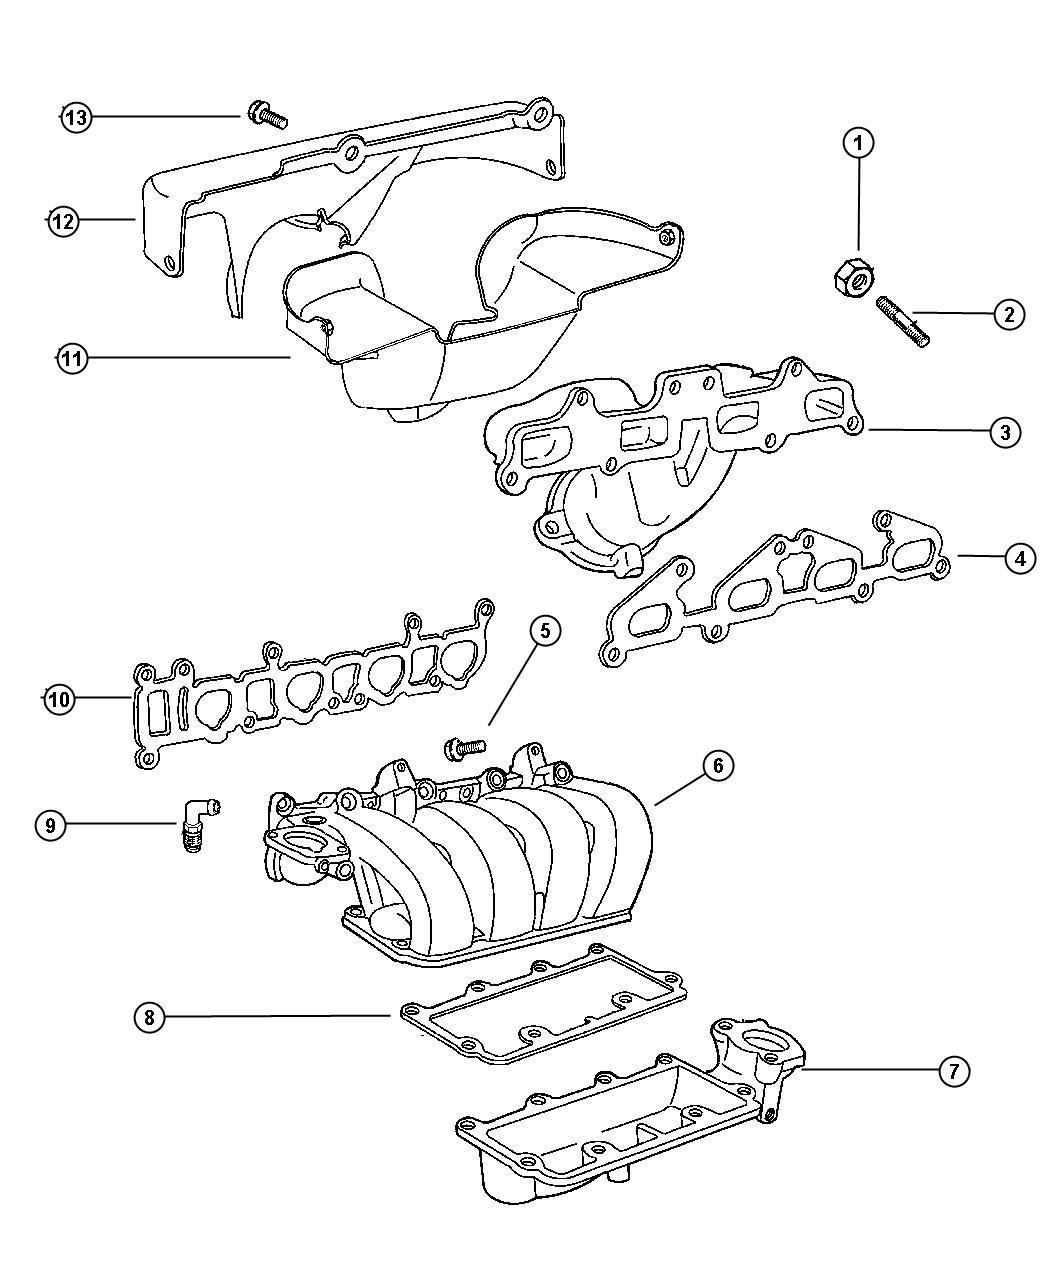 Plymouth Breeze Gasket. Intake manifold. Intake manifold